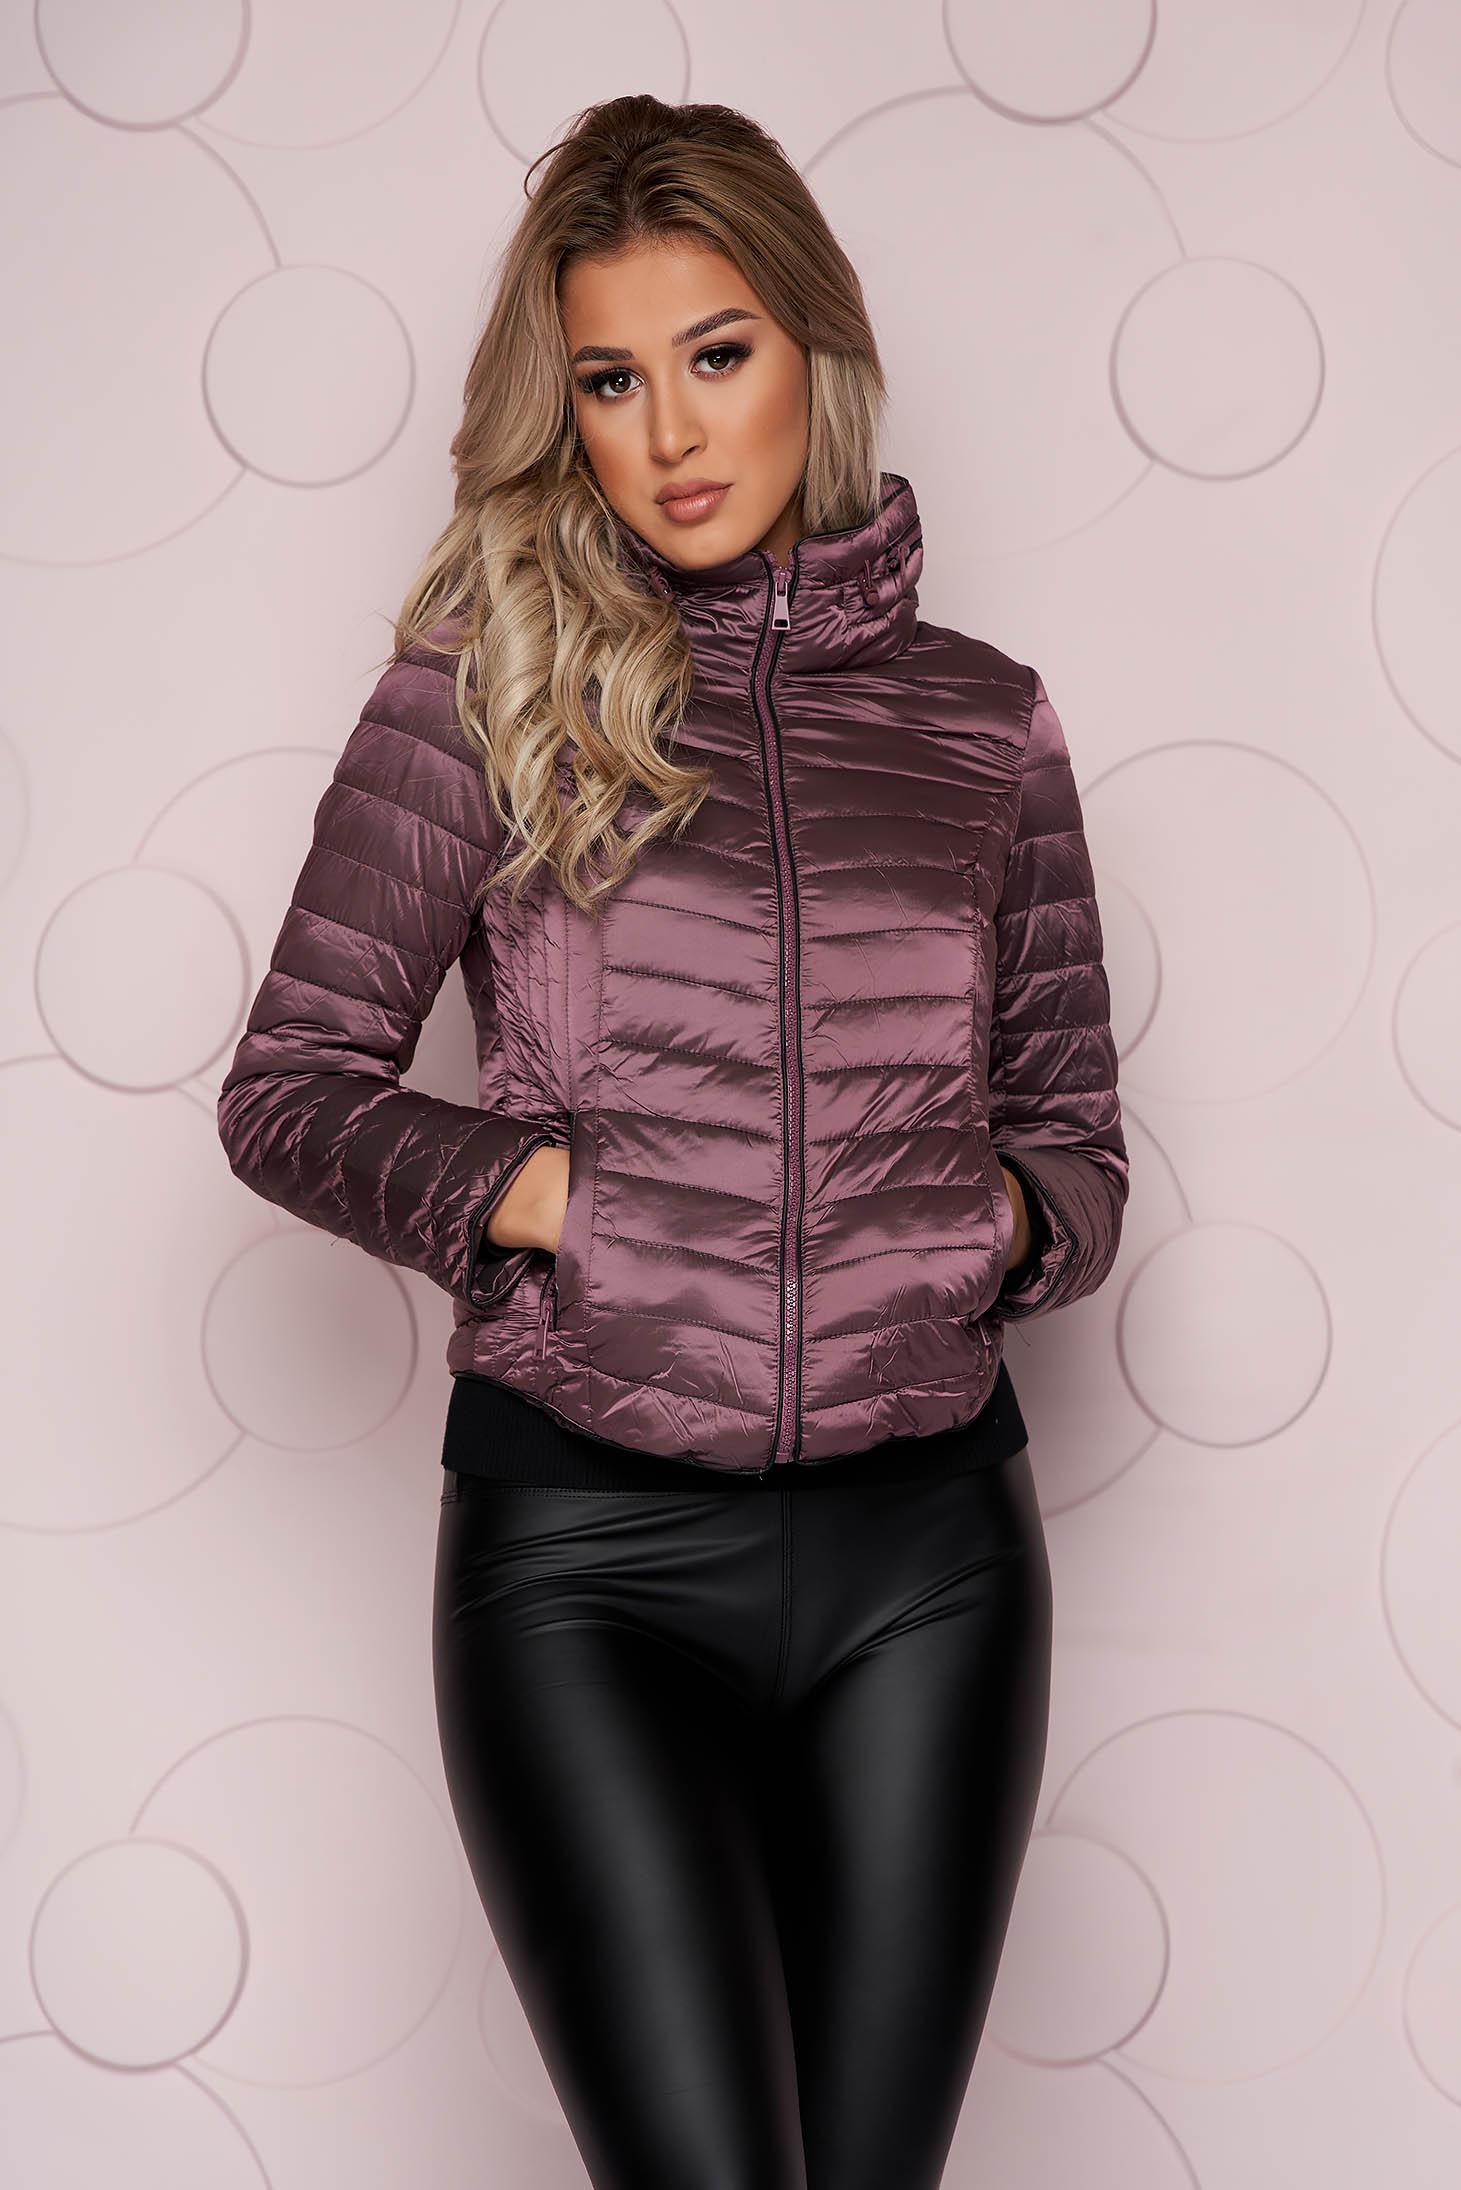 Purple jacket tented short cut from slicker with zipper details pockets